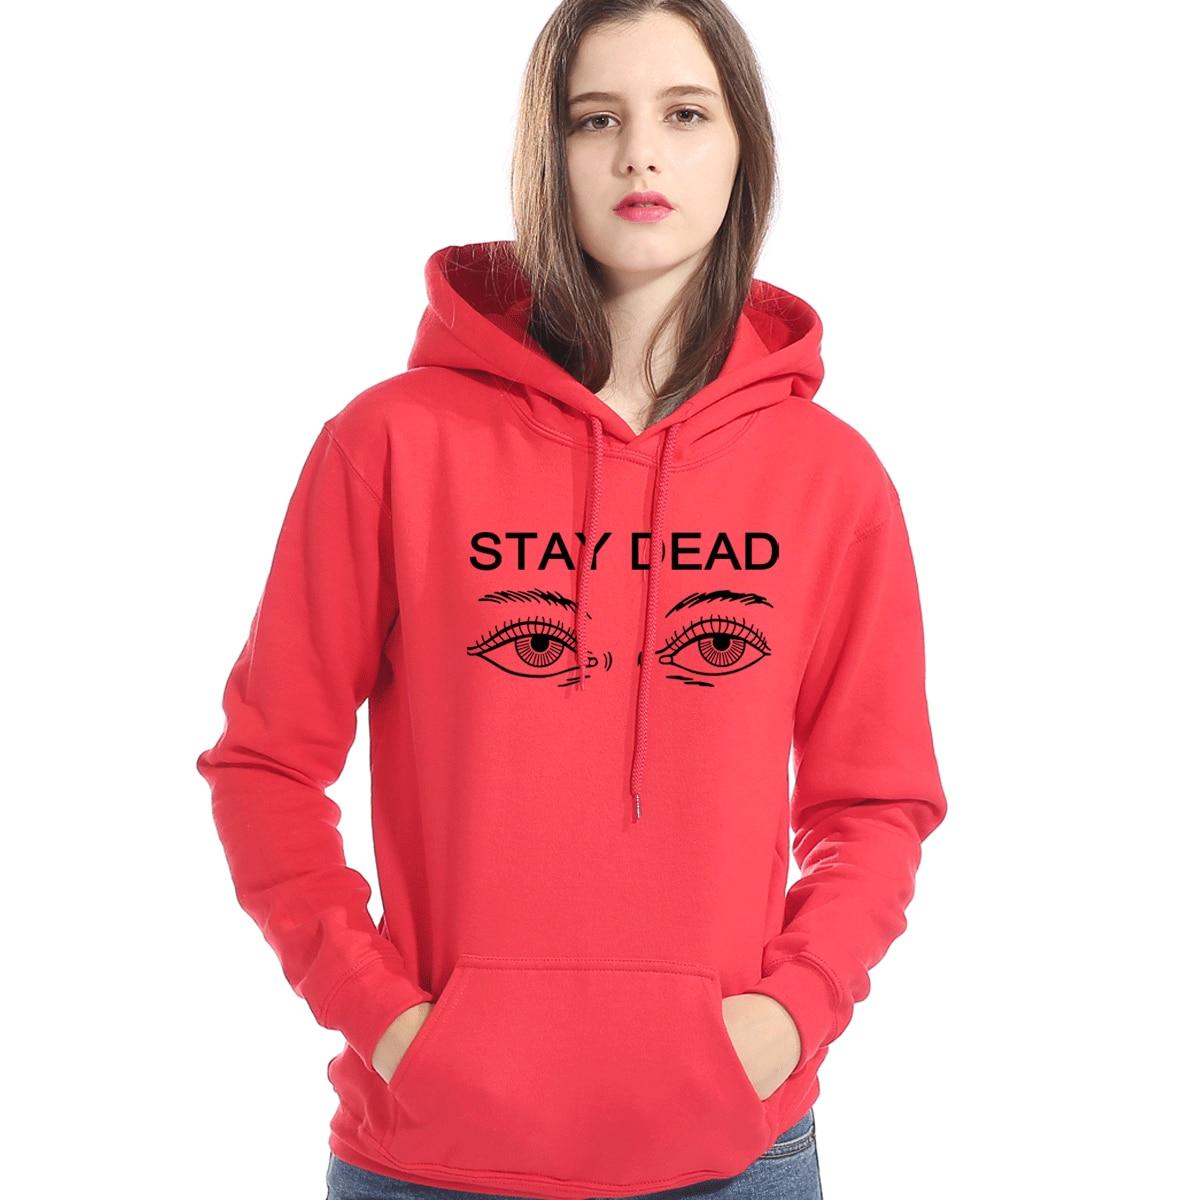 STAY DEAD Eyes Gothic Hoodies For Women 2019 Autumn Winter Brand Clothes Harajuku Women's Sweatshirt Hip Hop Coat Kpop Hoodie